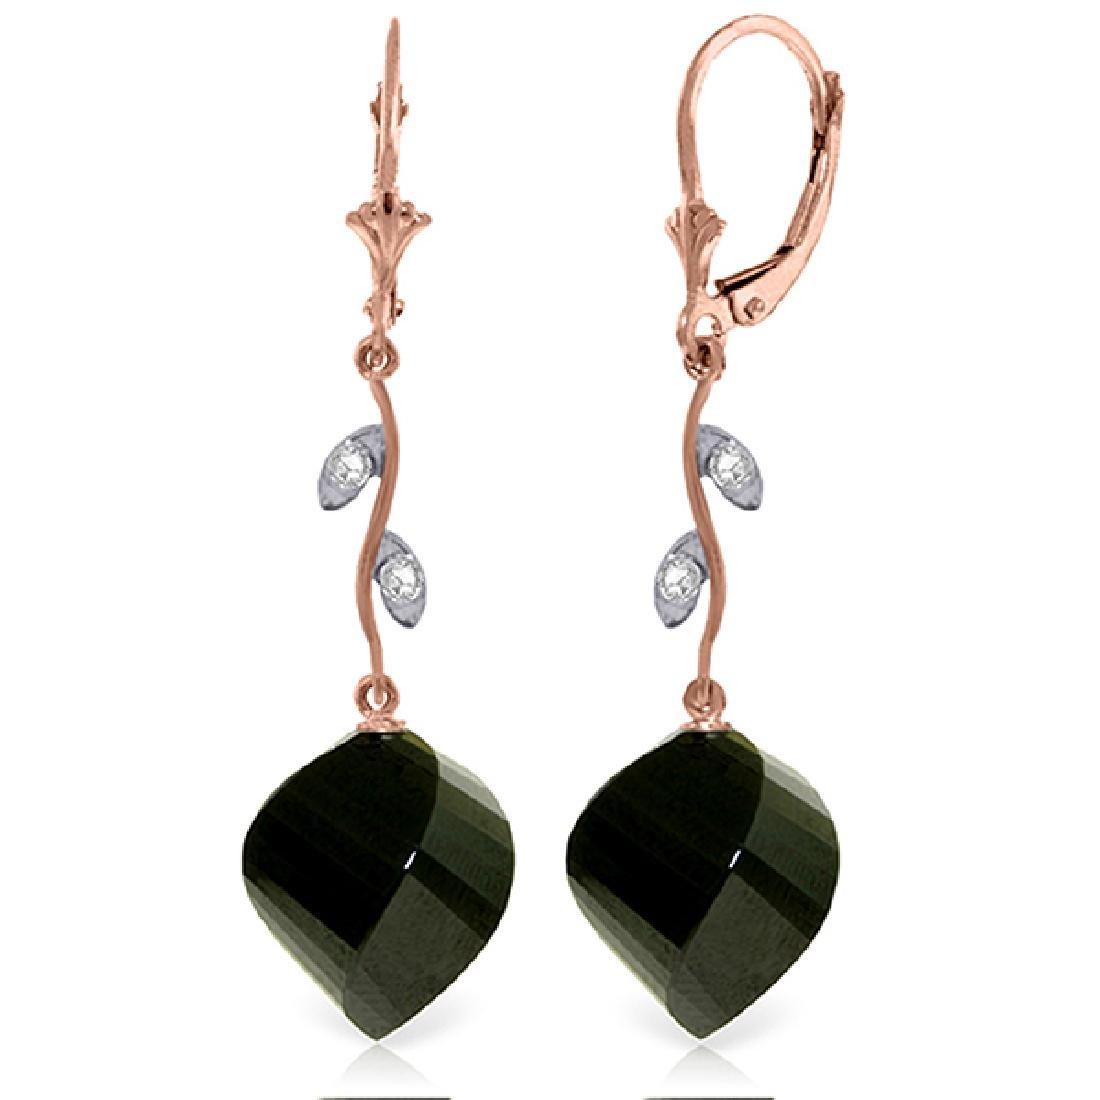 Genuine 31.02 ctw Black Spinel & Diamond Earrings